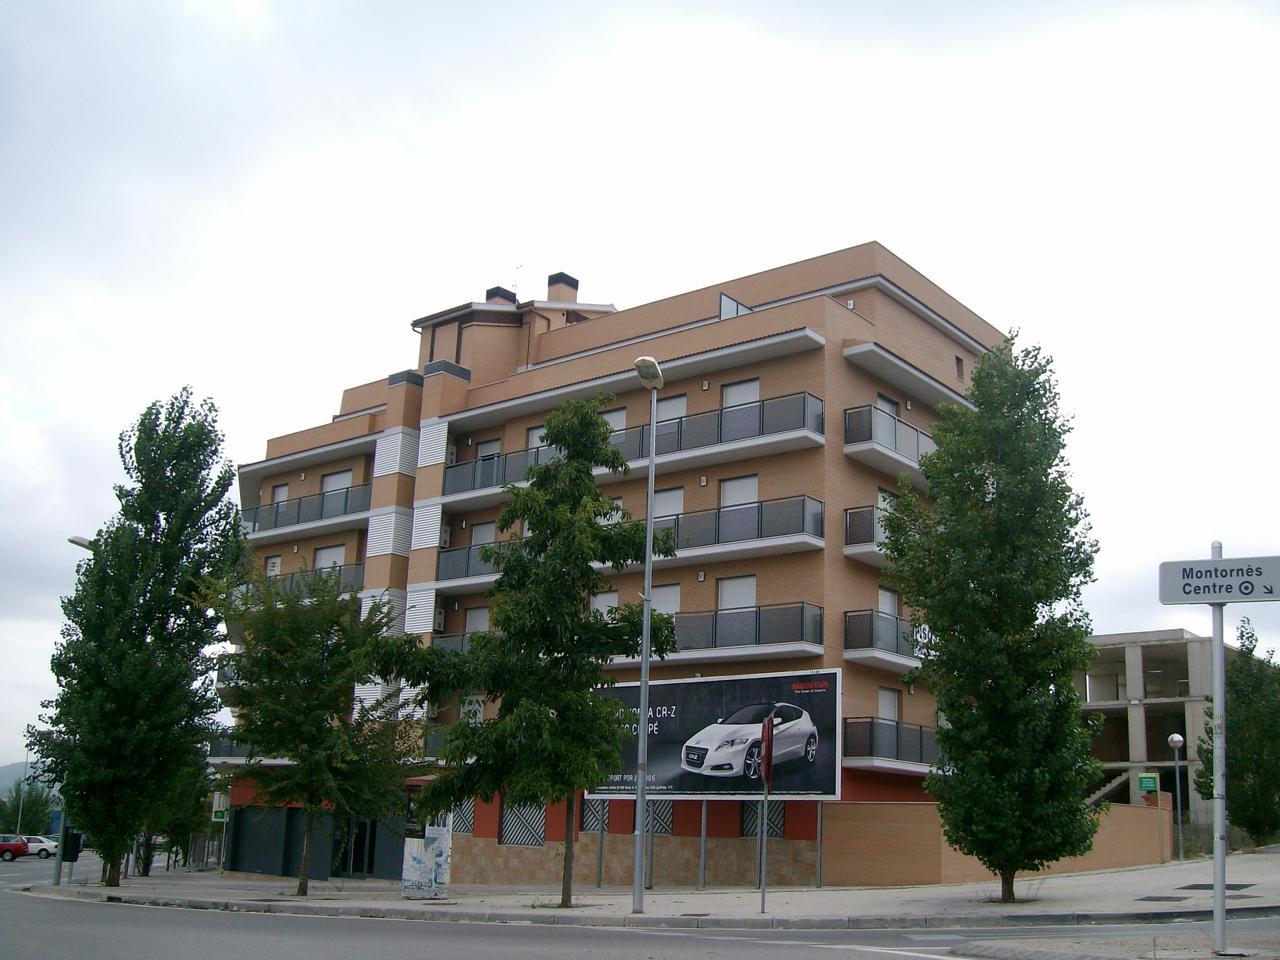 piso en montornes-del-valles · avinguda-d'ernest-lluch-08170 240000€